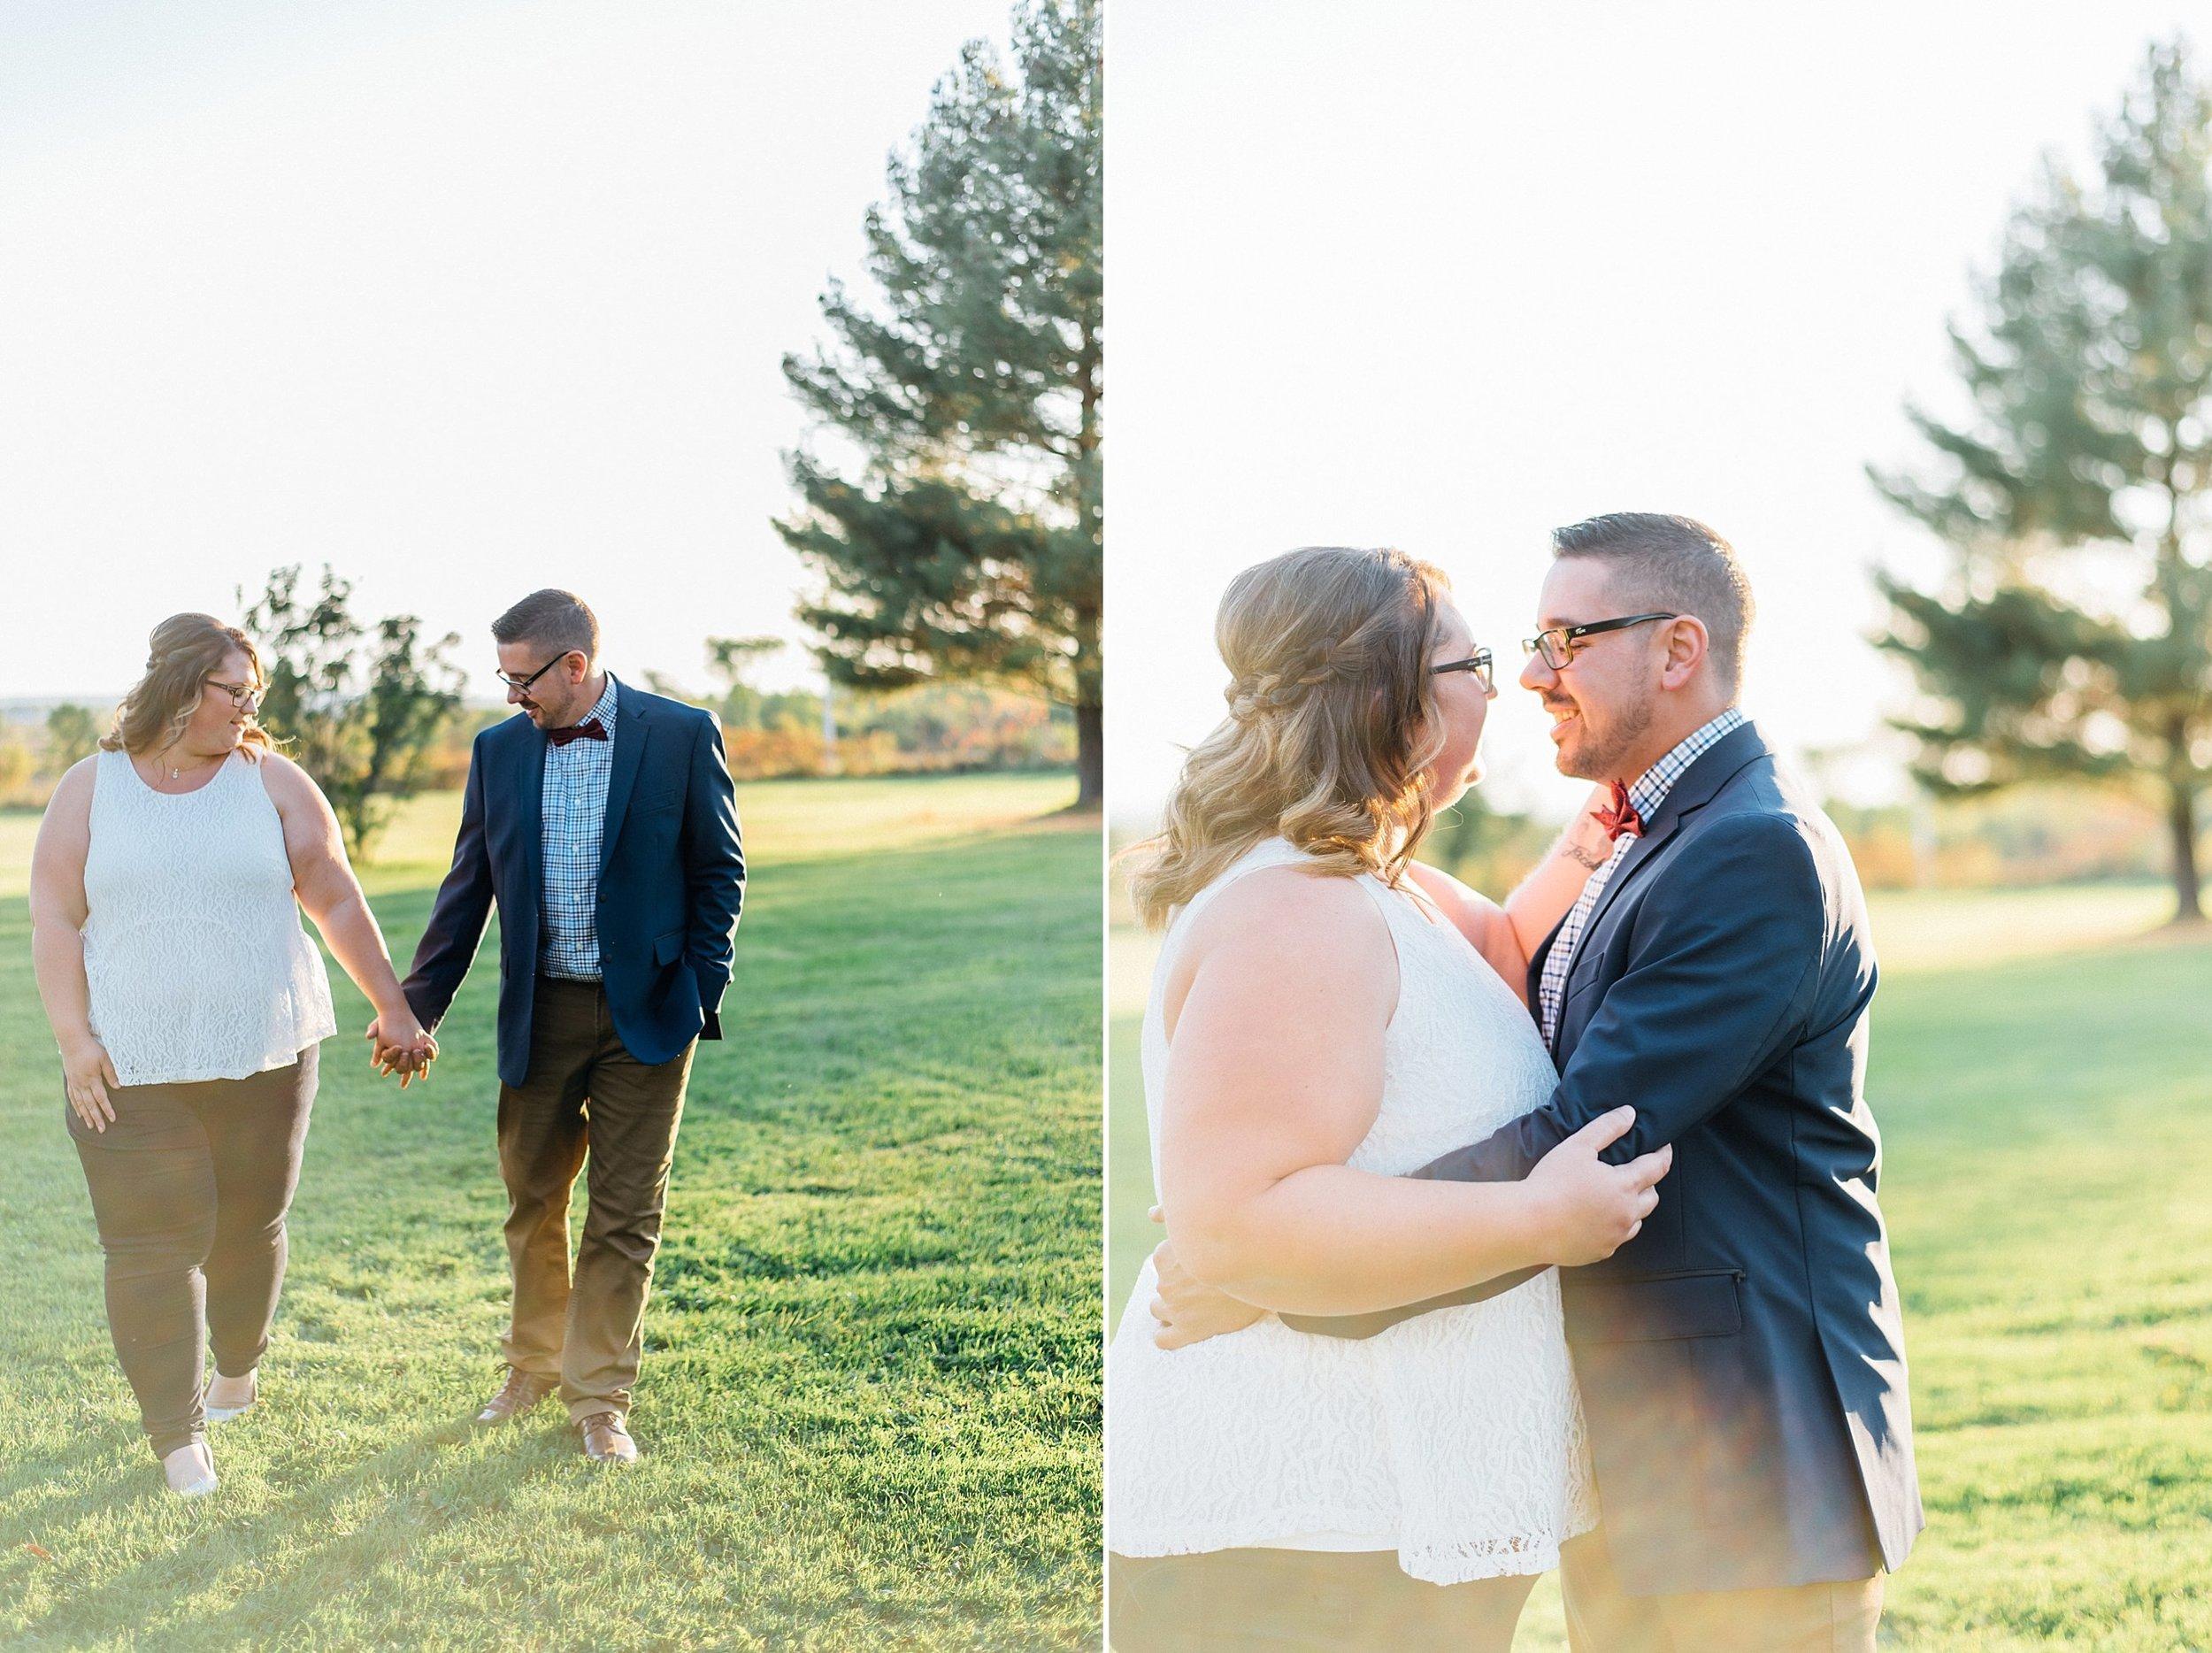 Ali and Batoul Photography - light, airy, indie documentary Ottawa wedding photographer_0164.jpg